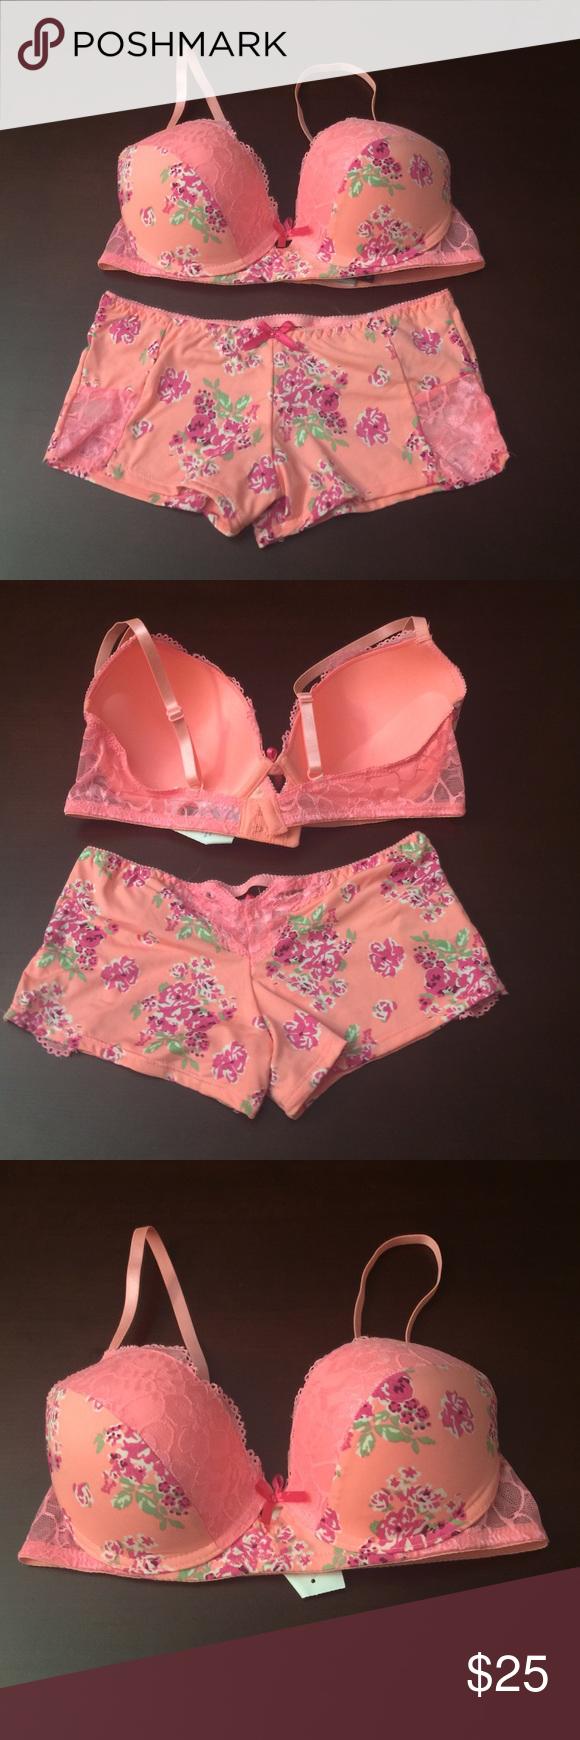 022a0e0c02b Kiss & Tell Bra and Panty Set Brand new small size underwear and 34 D size  bra Kiss & Tell Intimates Intimates & Sleepwear